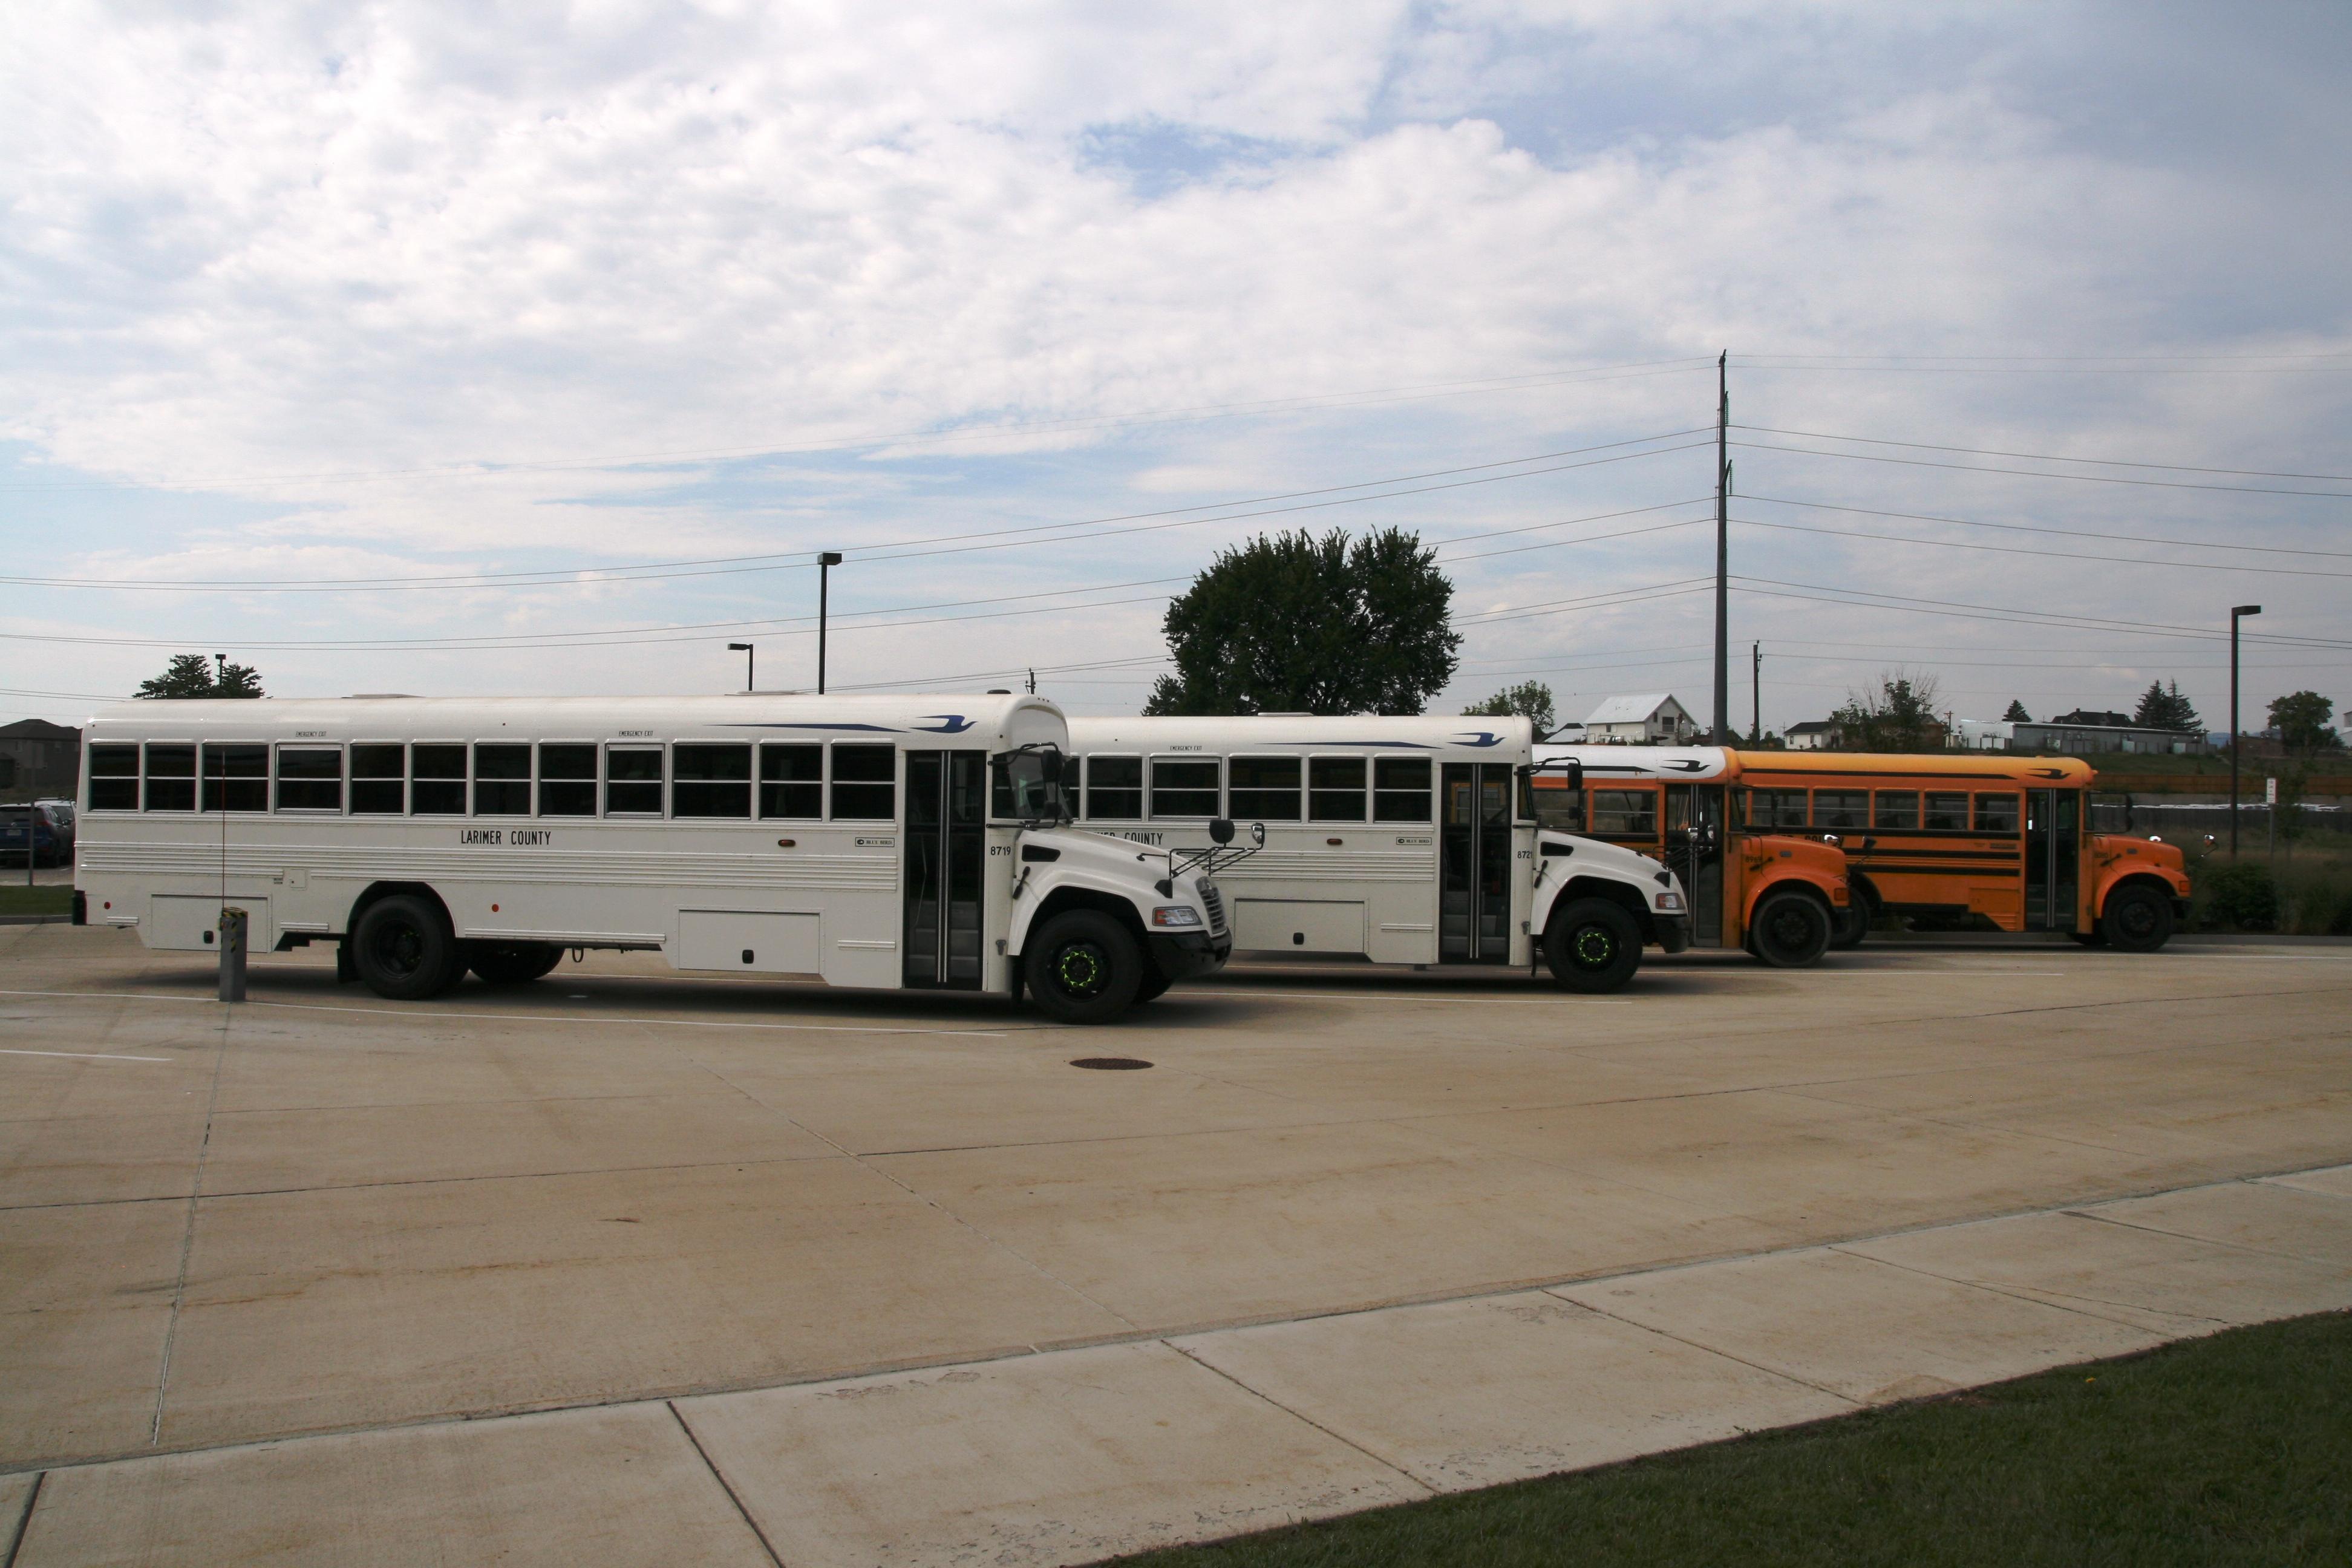 Image 2: Work Crew Buses